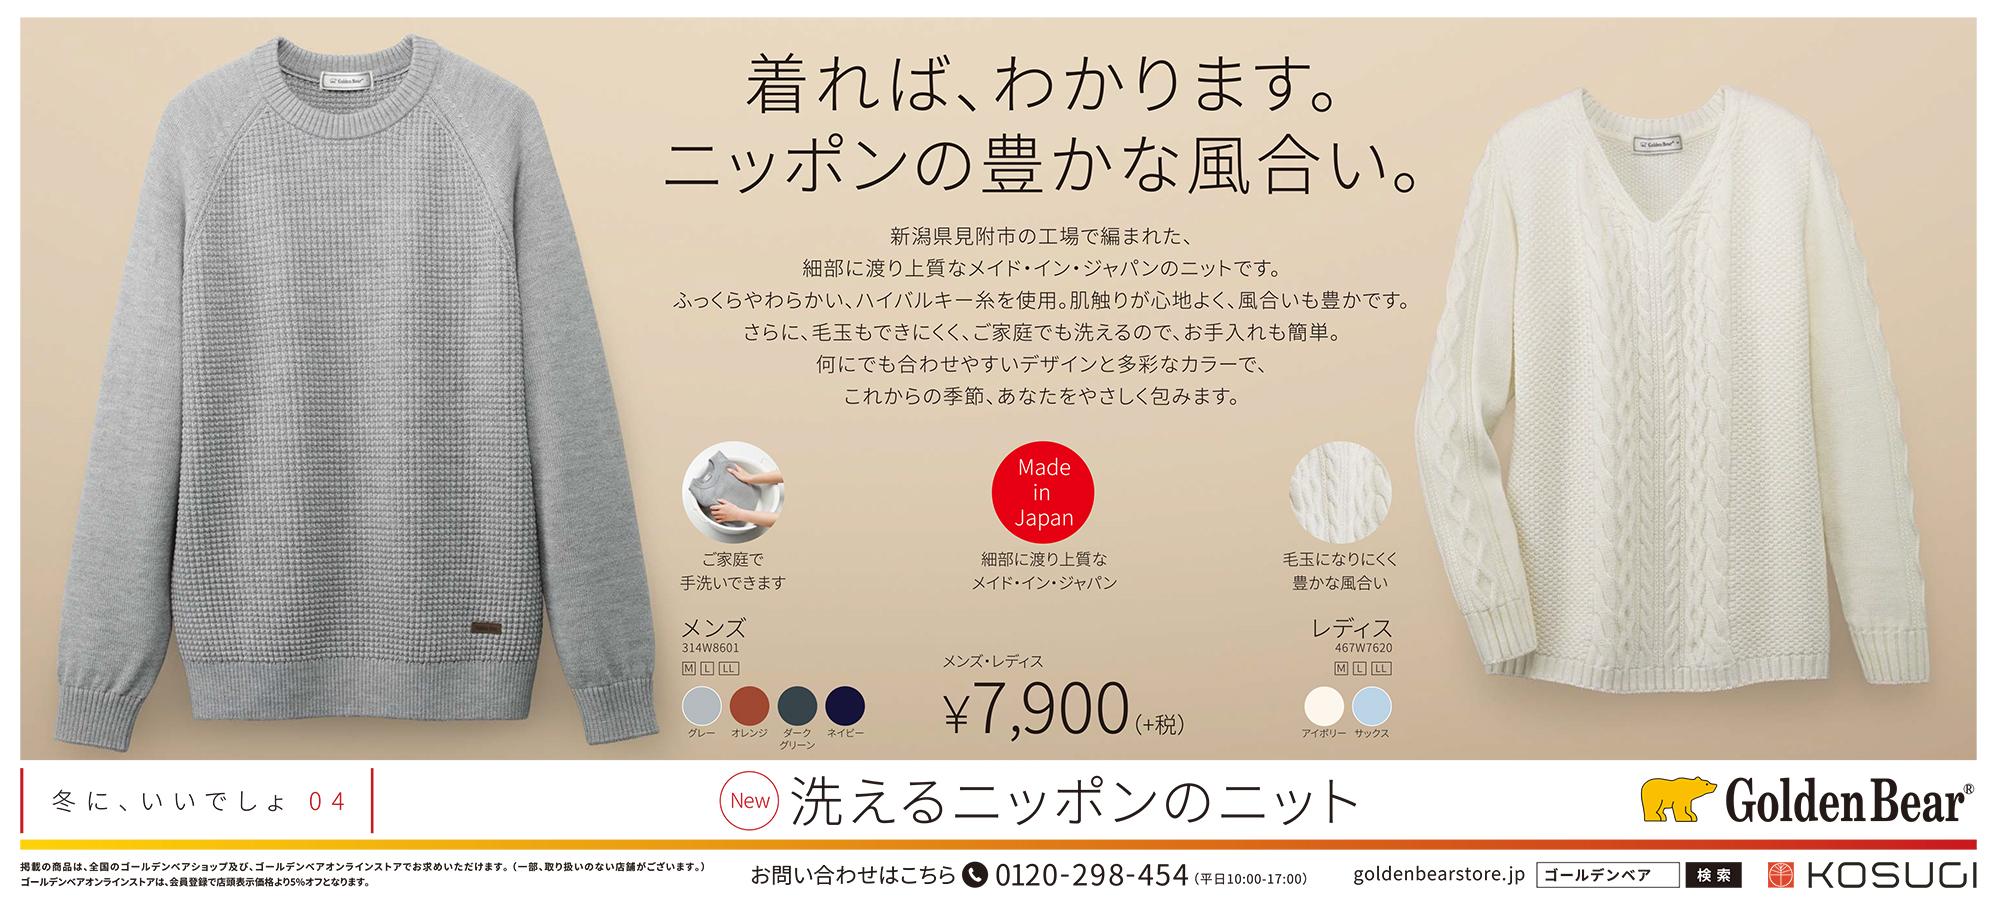 _4_gb_2018_aw_knit_5d_asahi.ai